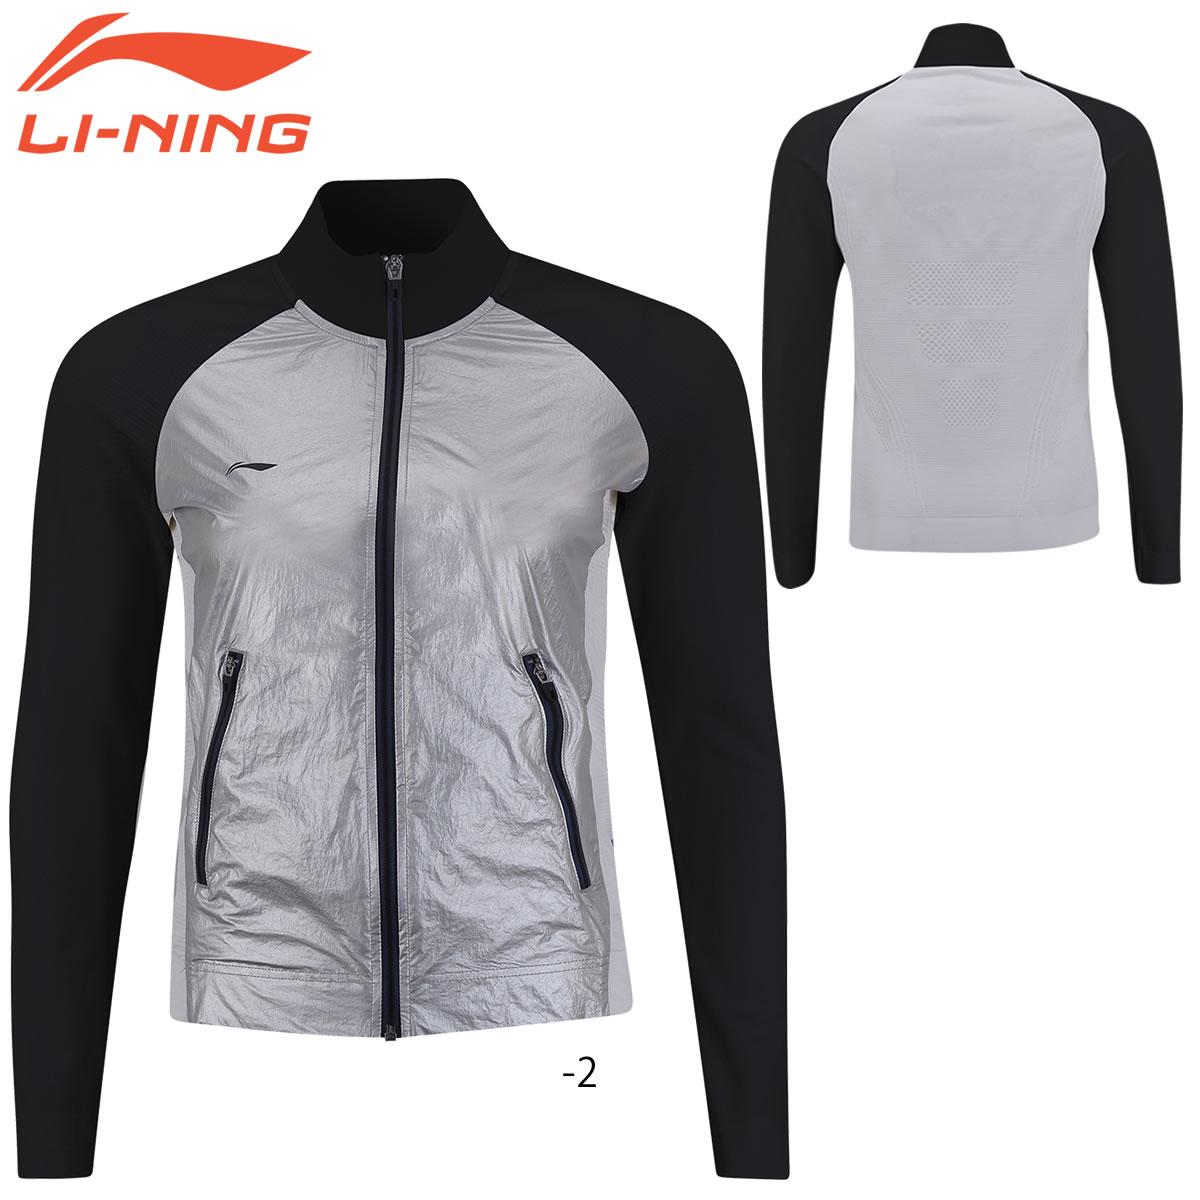 LI-NING AYYP013 ウォームアップジャケット(ユニ/メンズ) バドミントンウェア リーニン